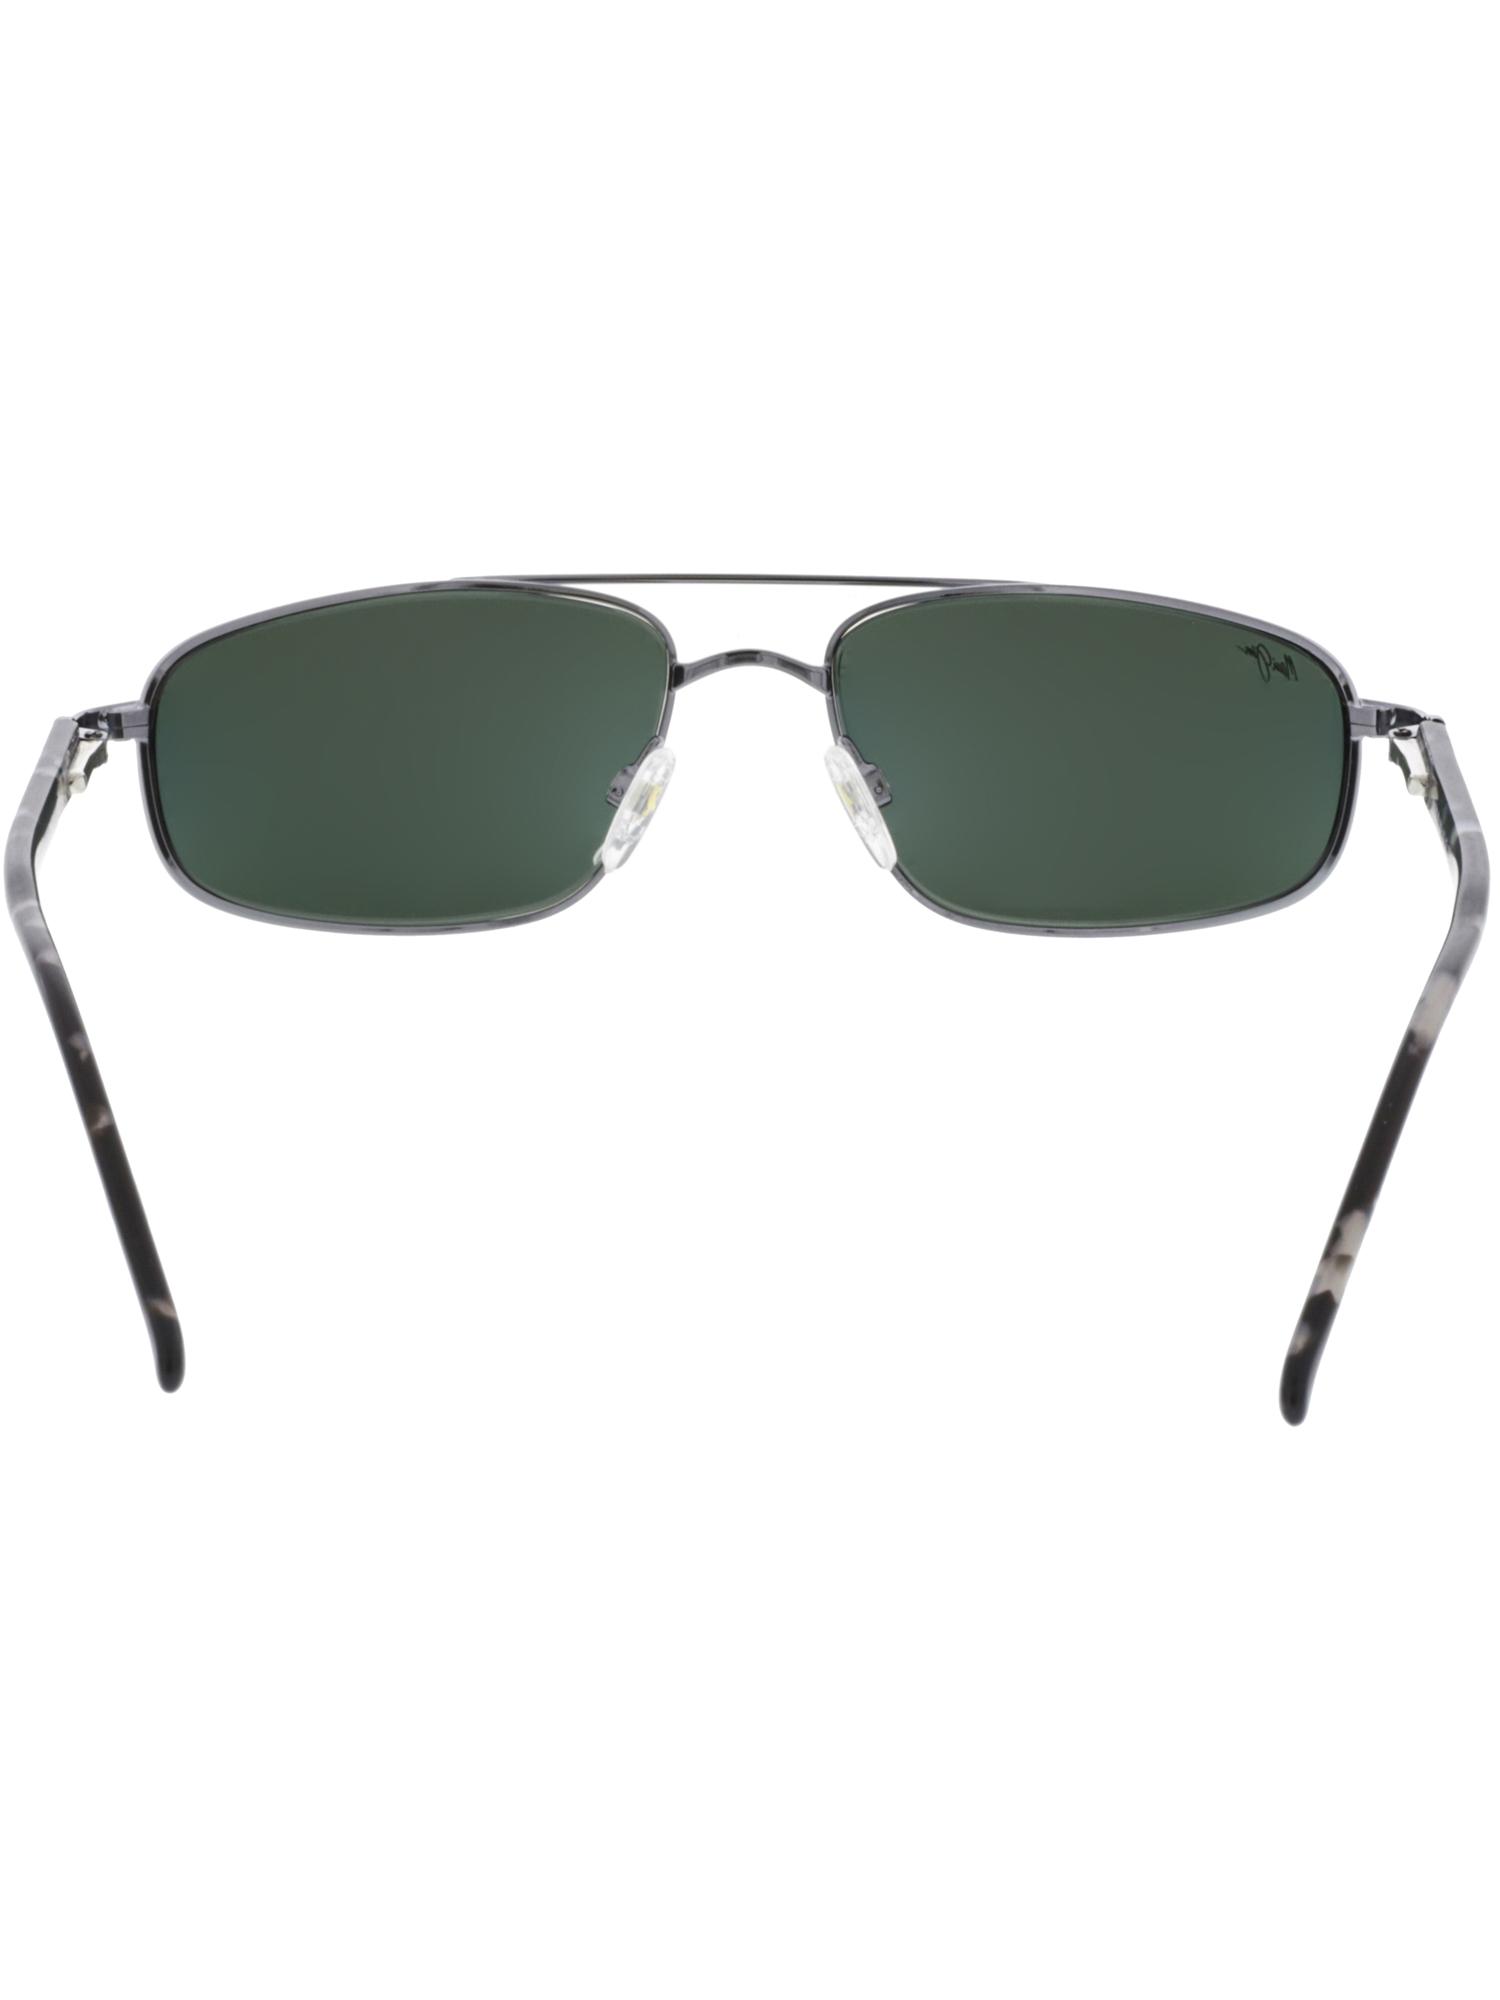 755e29c64d37 Maui Jim - Maui Jim Men's Kahuna 162-02 Silver Aviator Sunglasses -  Walmart.com